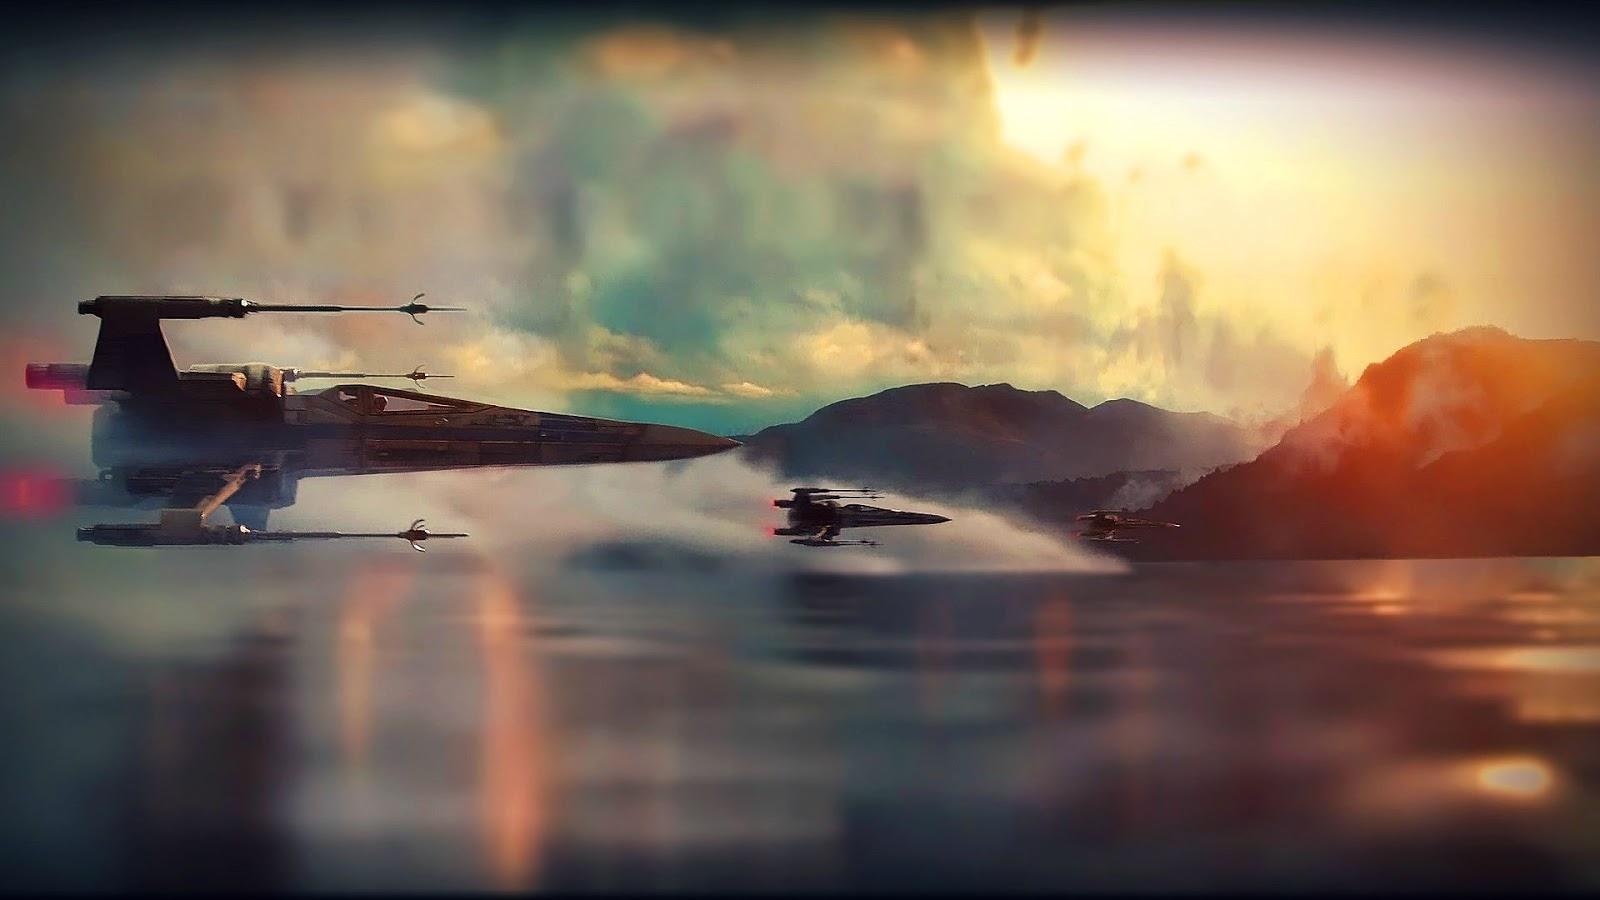 High Resolution Star Wars Desktop Wallpaper 1920x1080 Wallpapershit